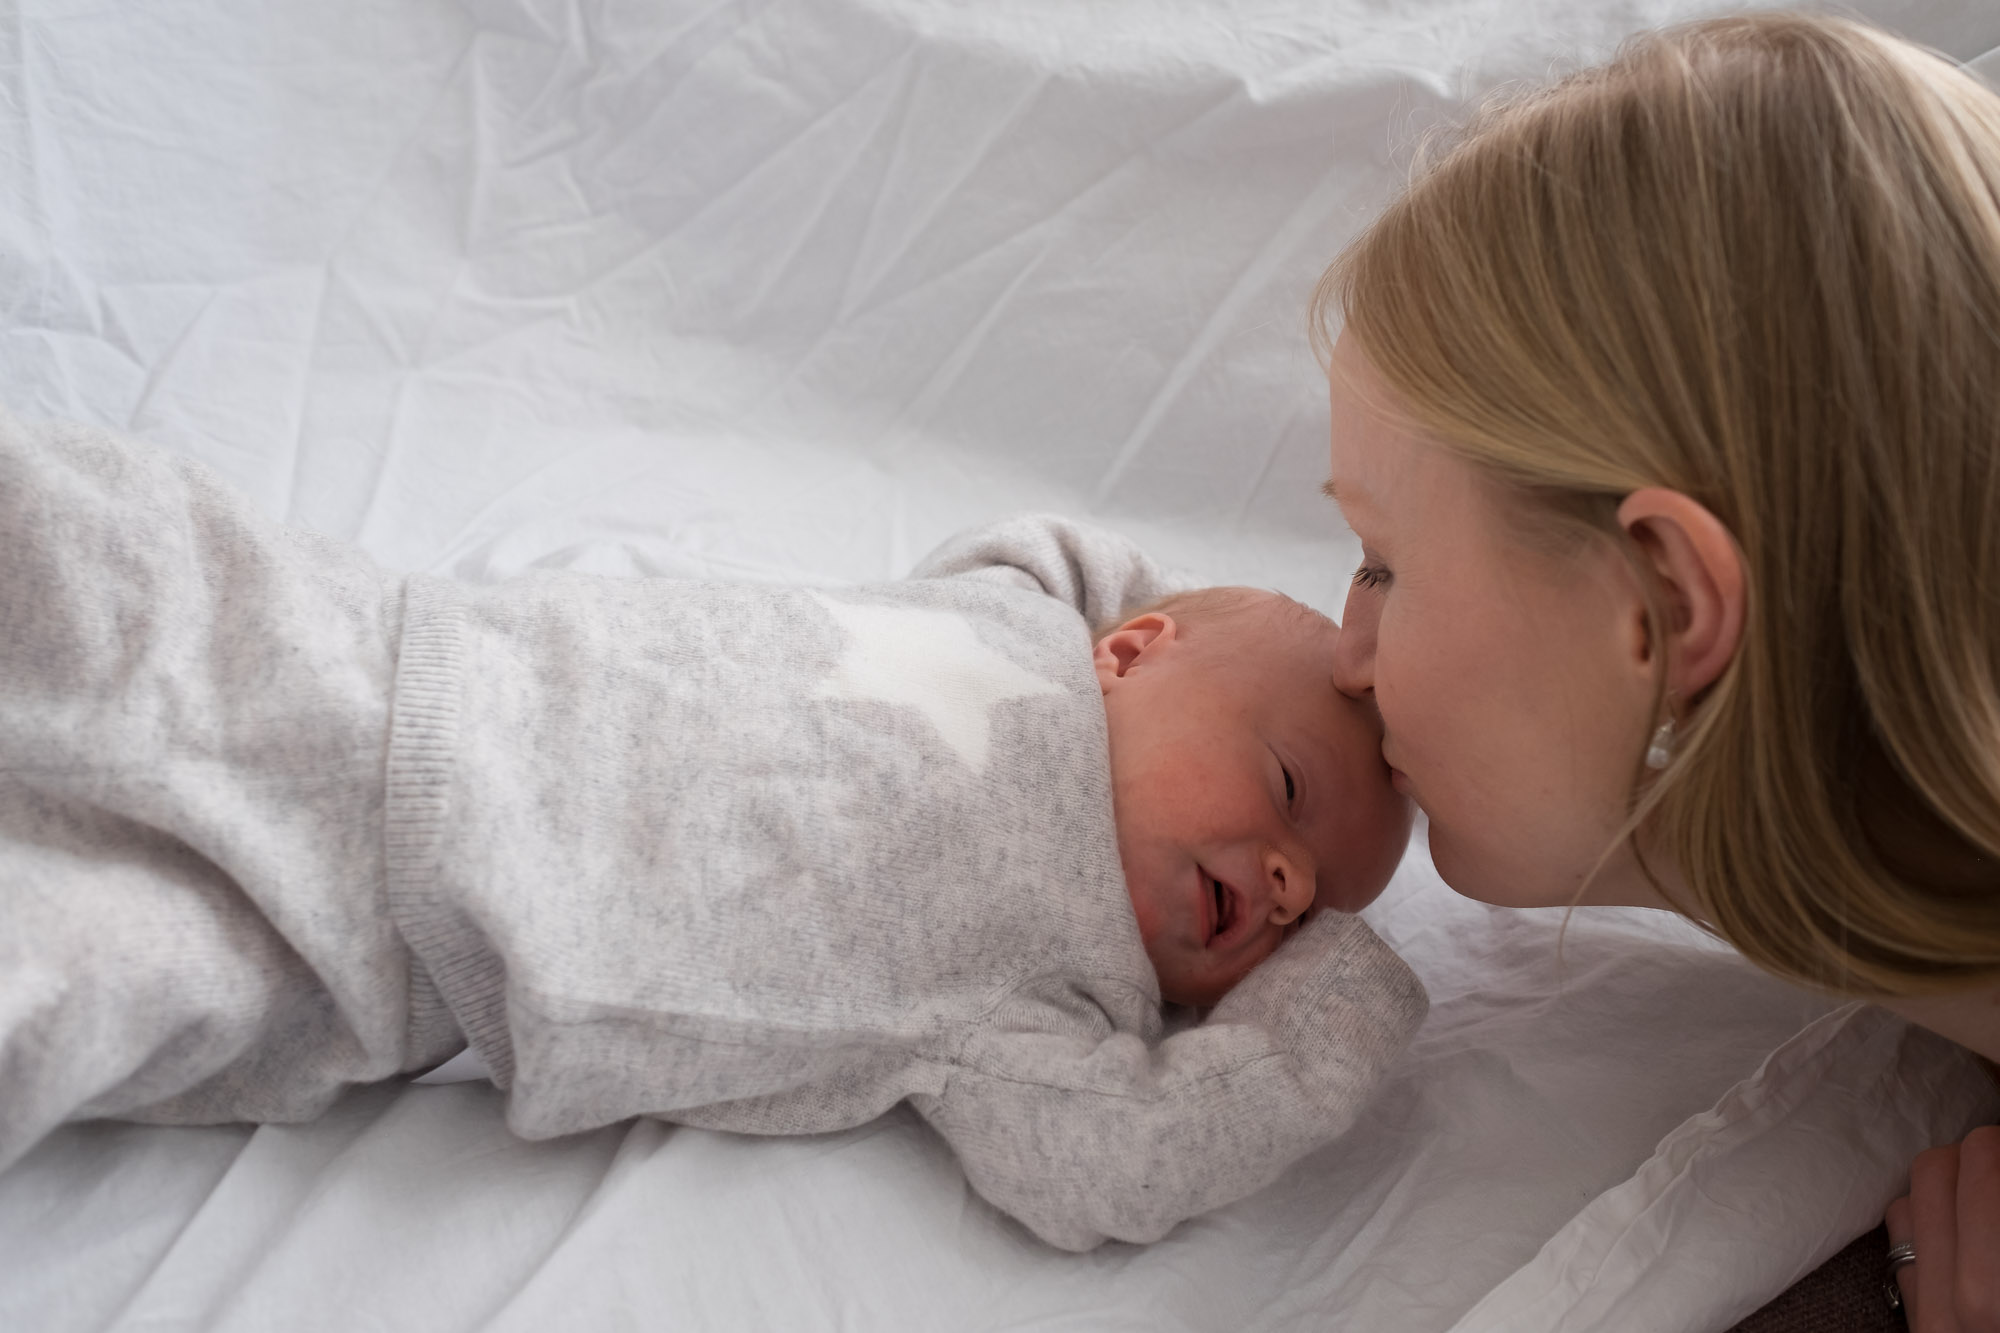 family-portrait-baby-photographer-157.jpg